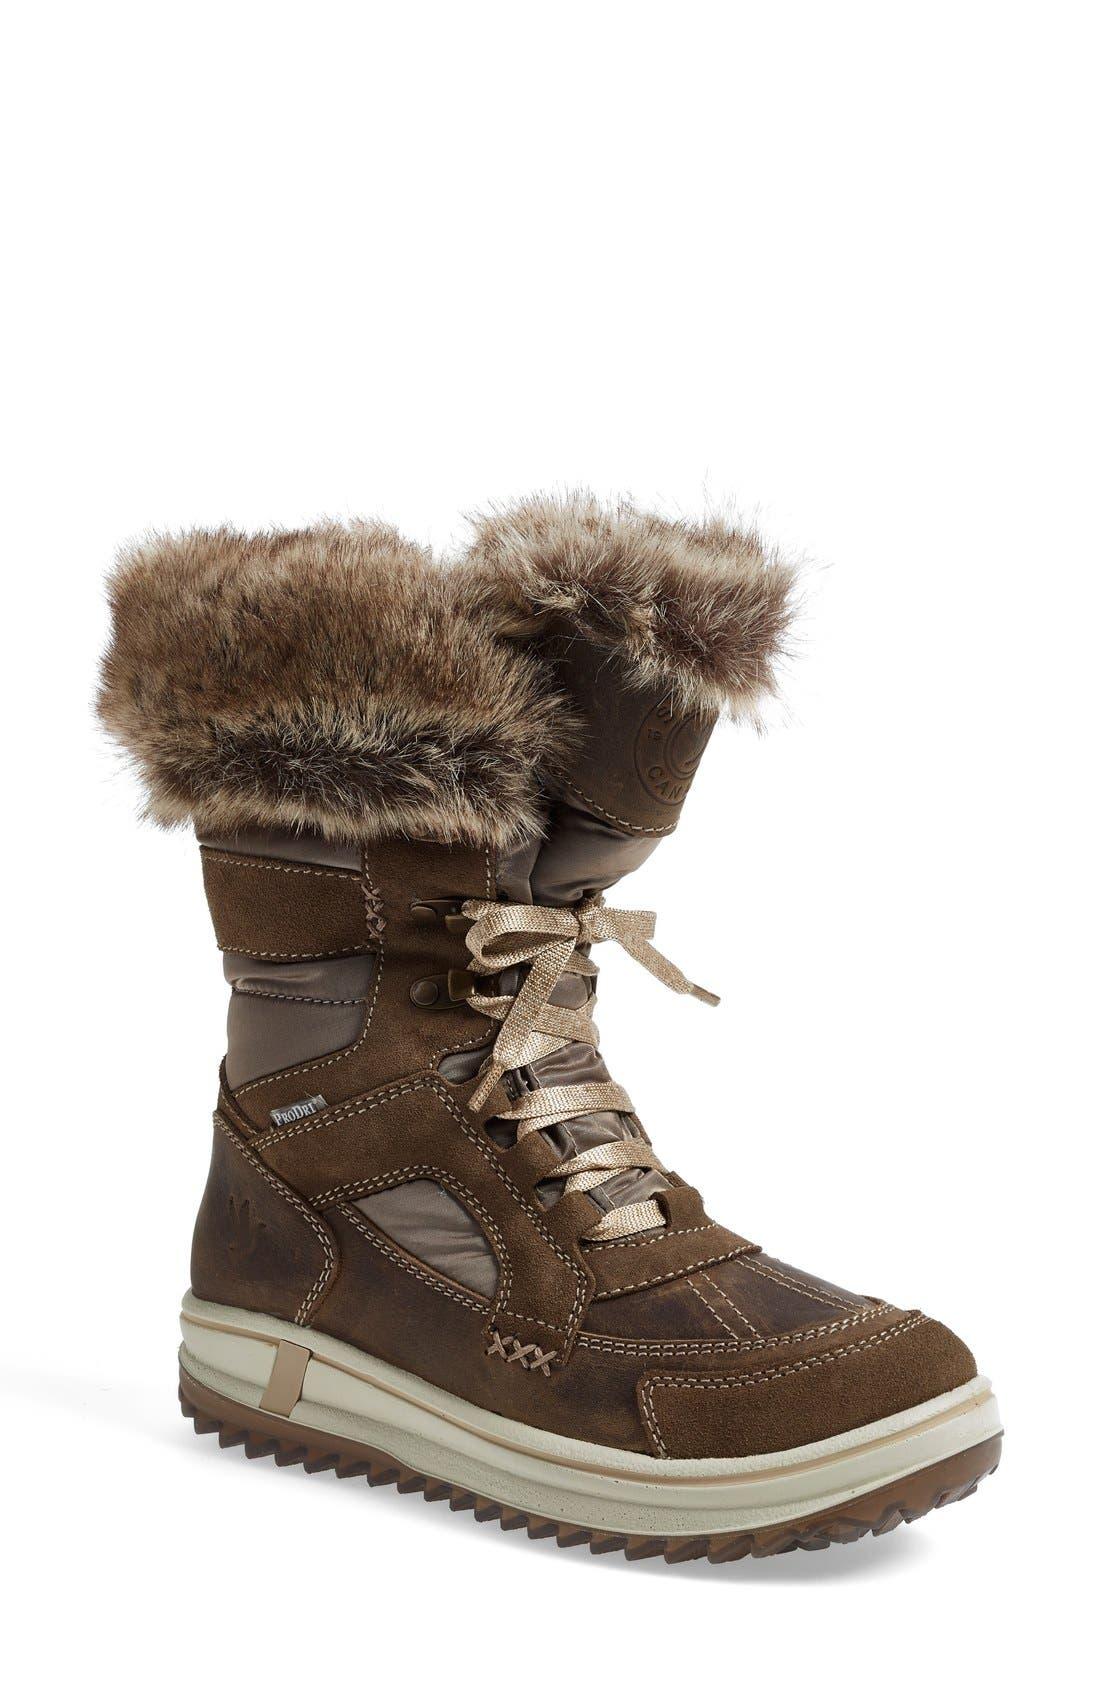 Alternate Image 1 Selected - Santana Canada 'Marta' Water Resistant Insulated Winter Boot (Women)